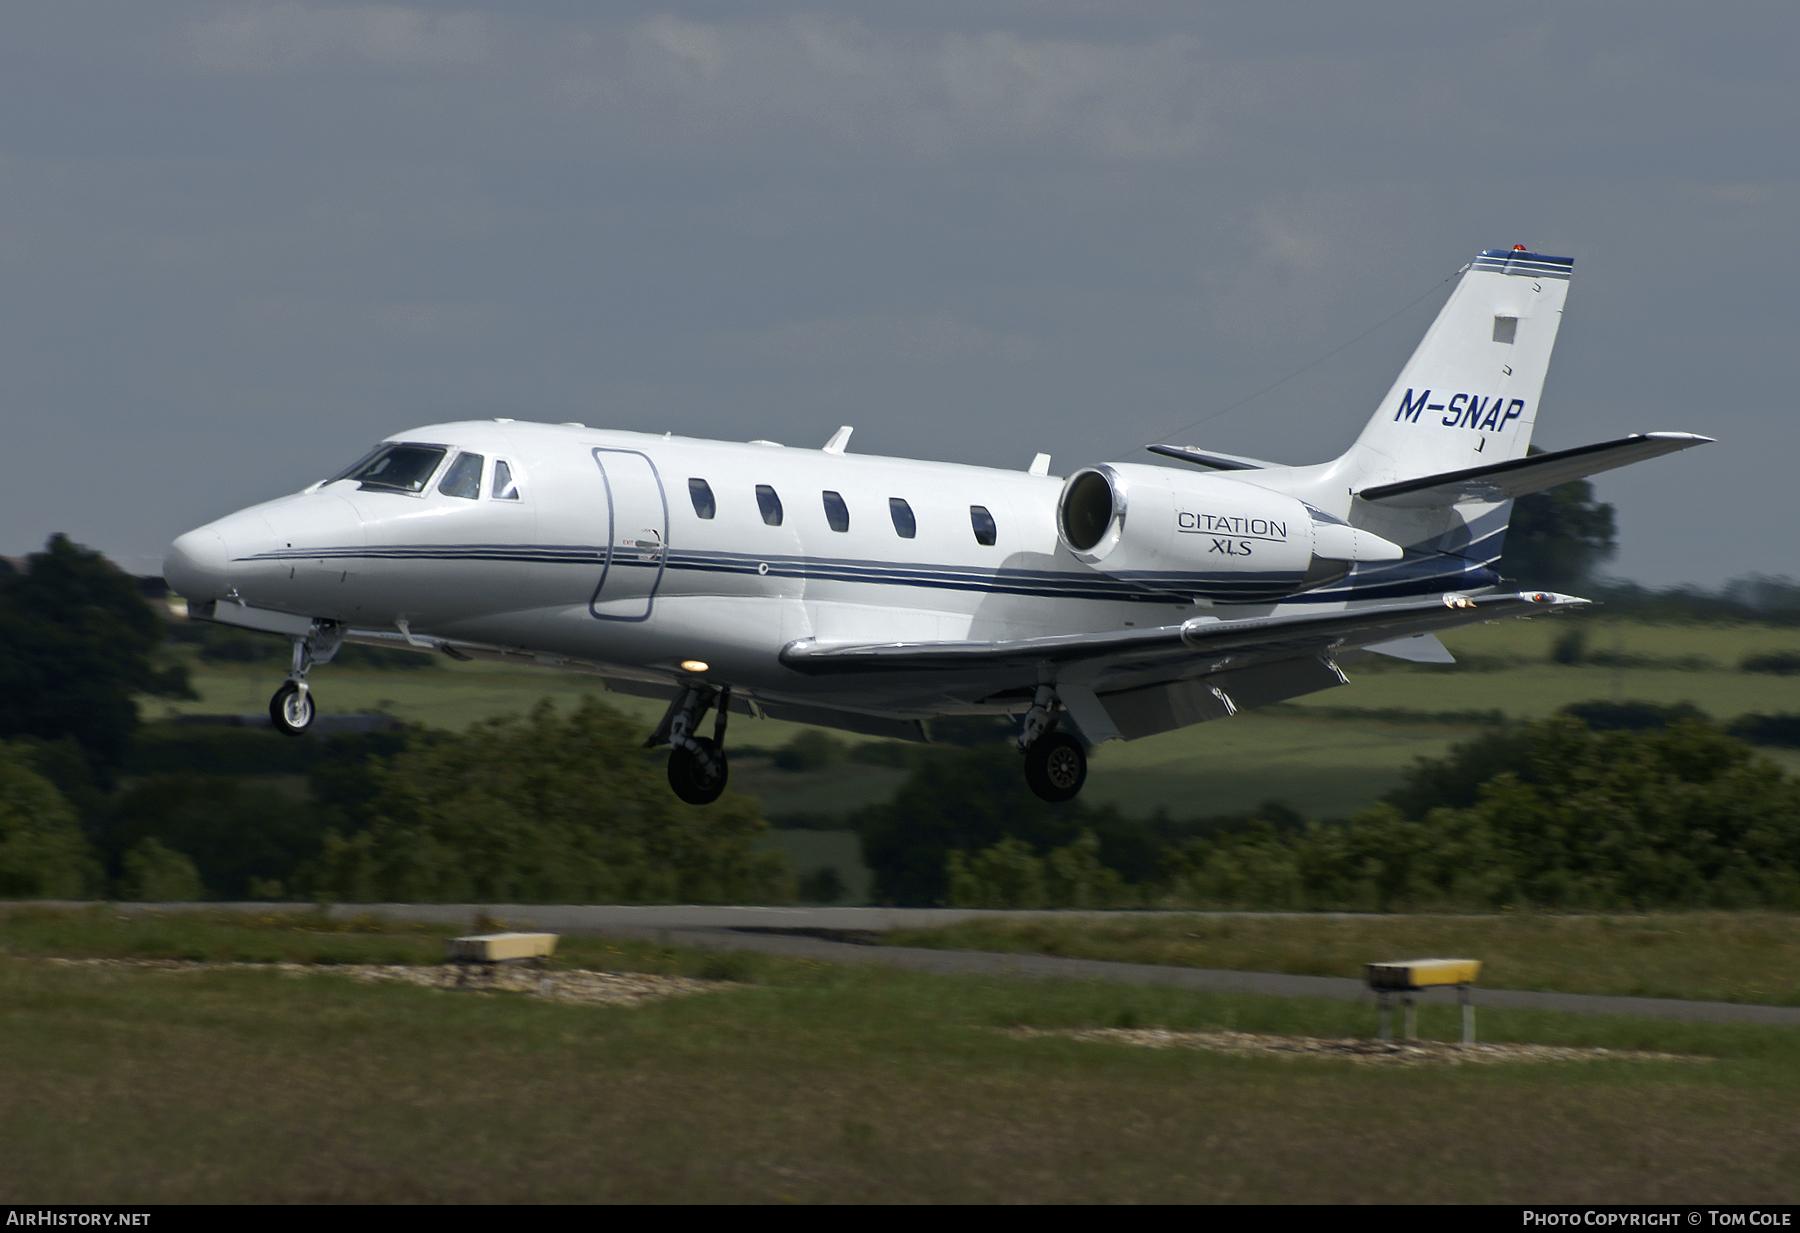 Aircraft Photo Of M Snap Cessna 560xl Citation Xls